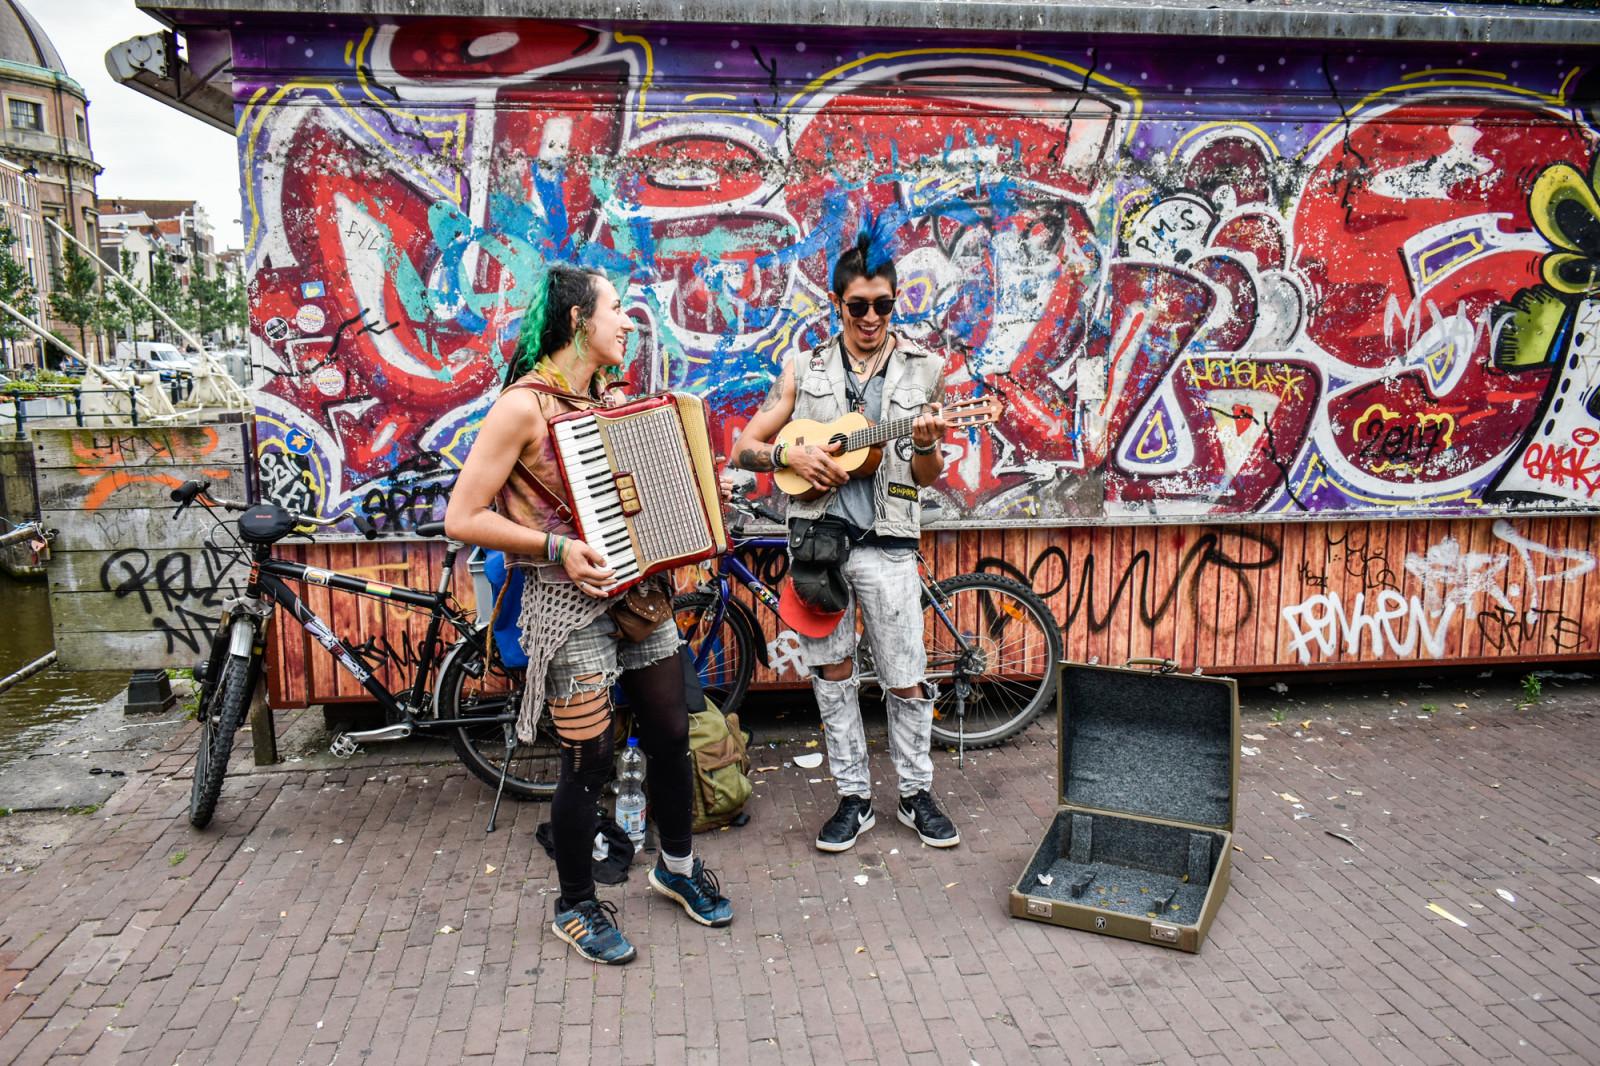 Two guys making street music in Amsterdam